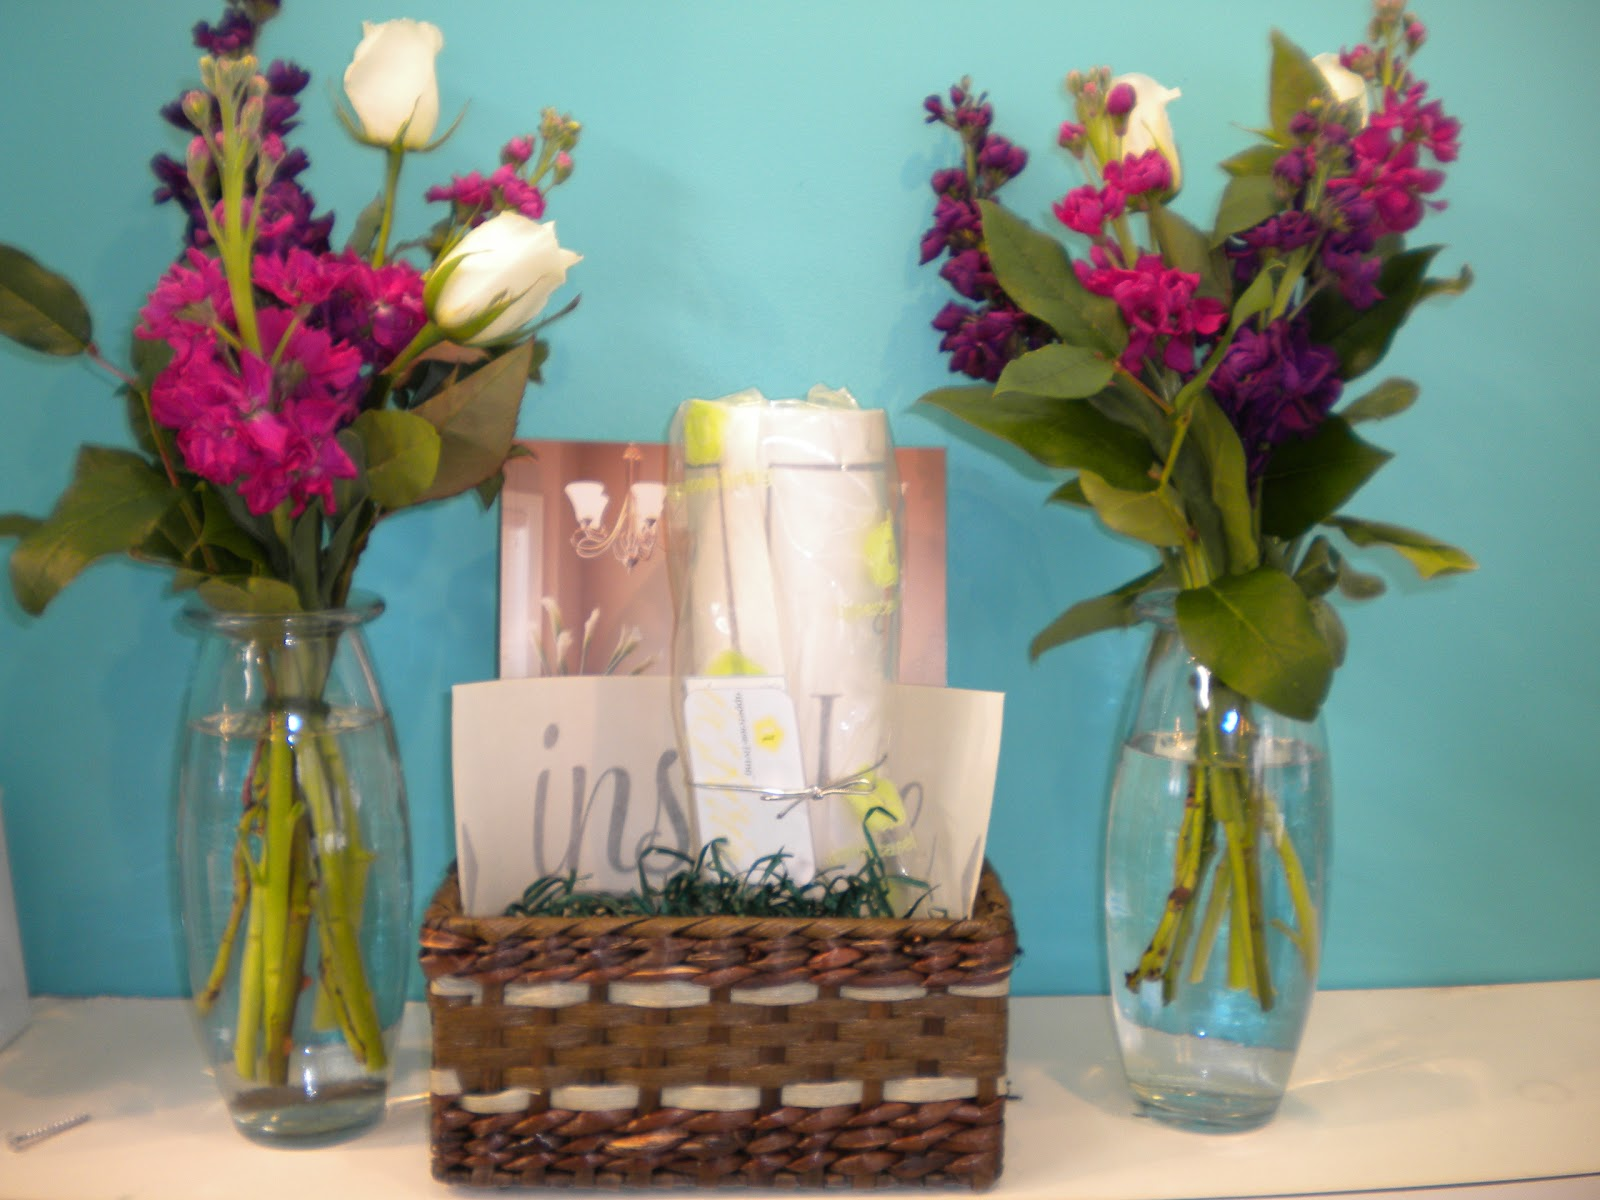 florist in sylvania ohio | Beautiful Blooms By Jen - Part 9